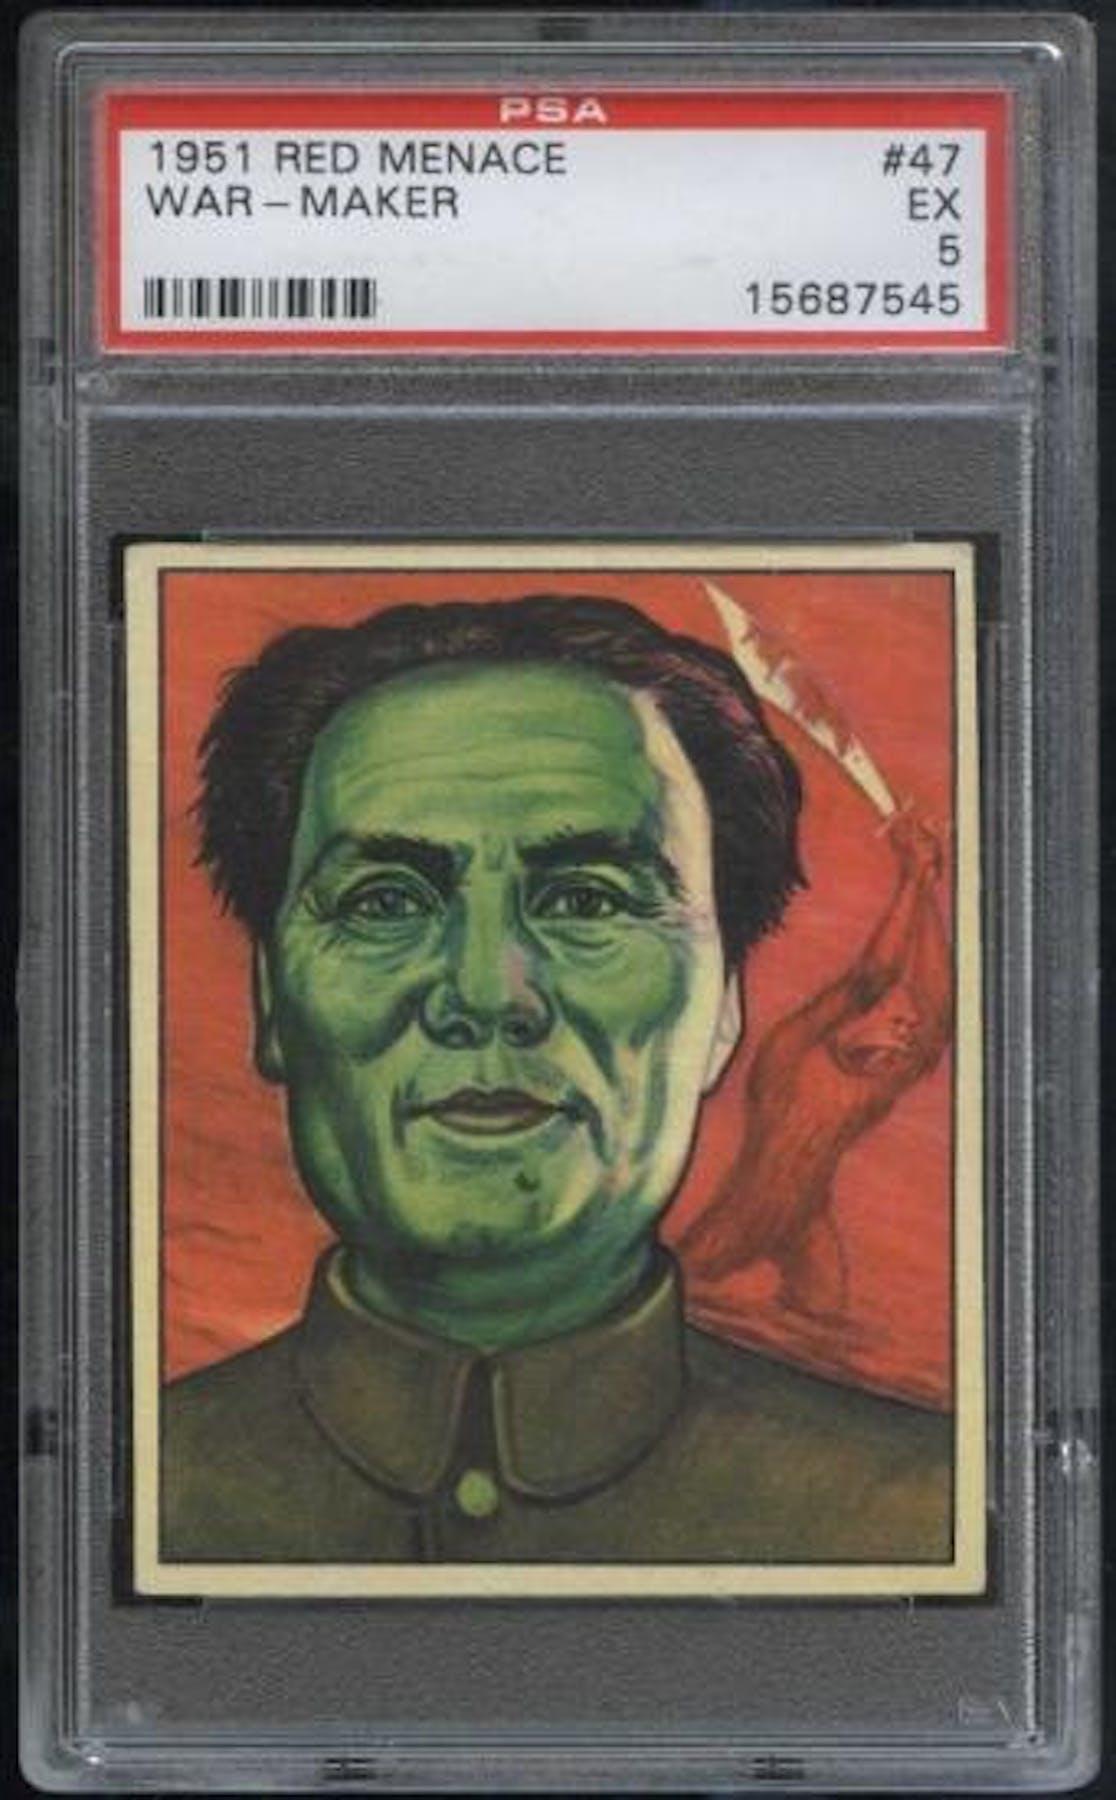 1951 red menace 47 war maker psa 5 ex 7545 da card world